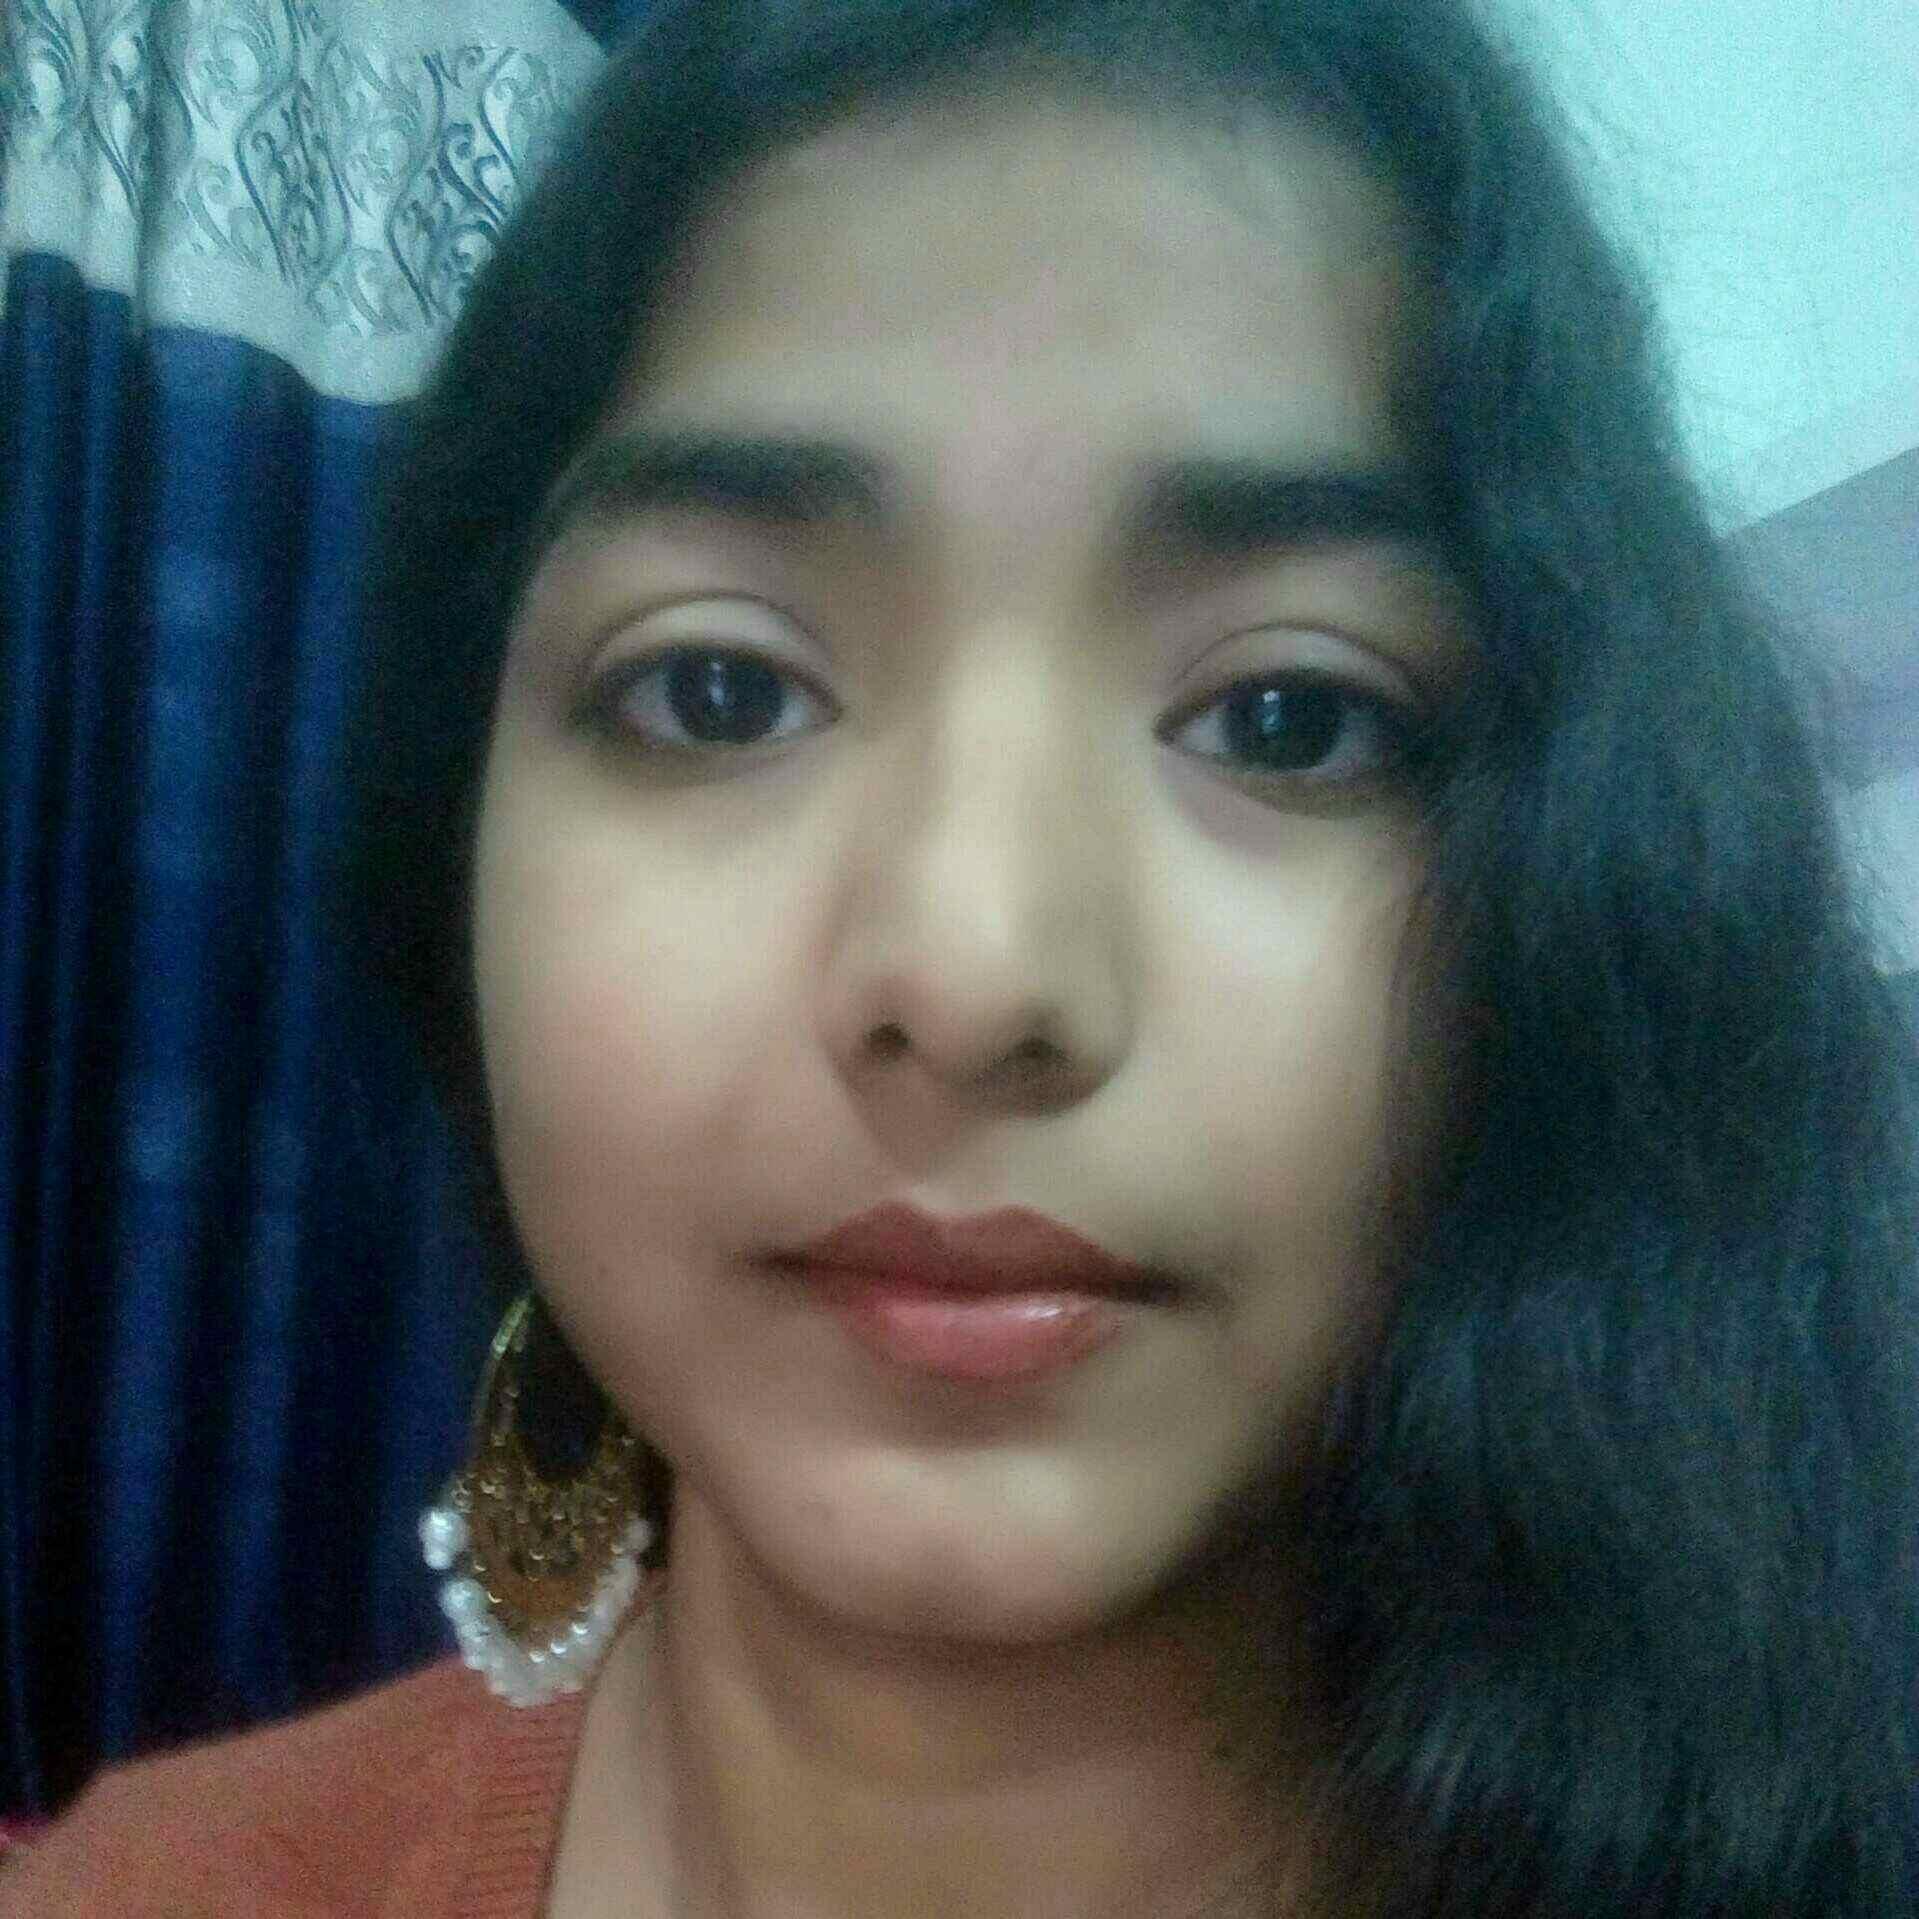 Mamta Azad Raizada  a shaira a storyteller and a writer too